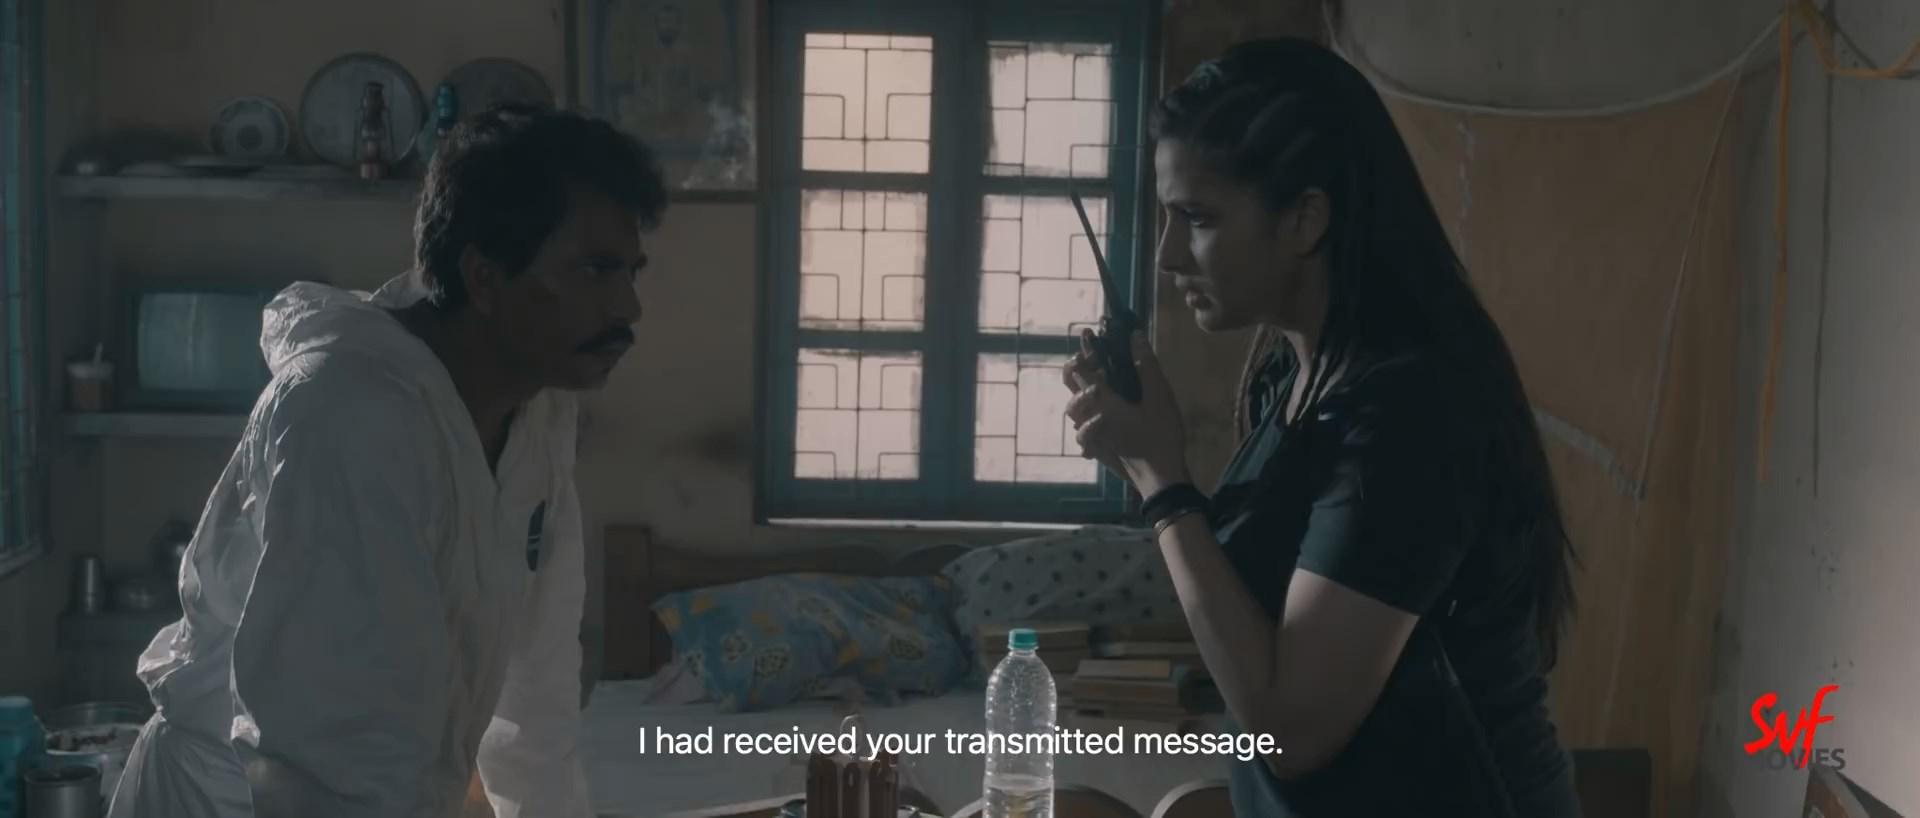 Zombiesthaan 2021 Full Bengali Film.mp4 snapshot 00.29.35.333